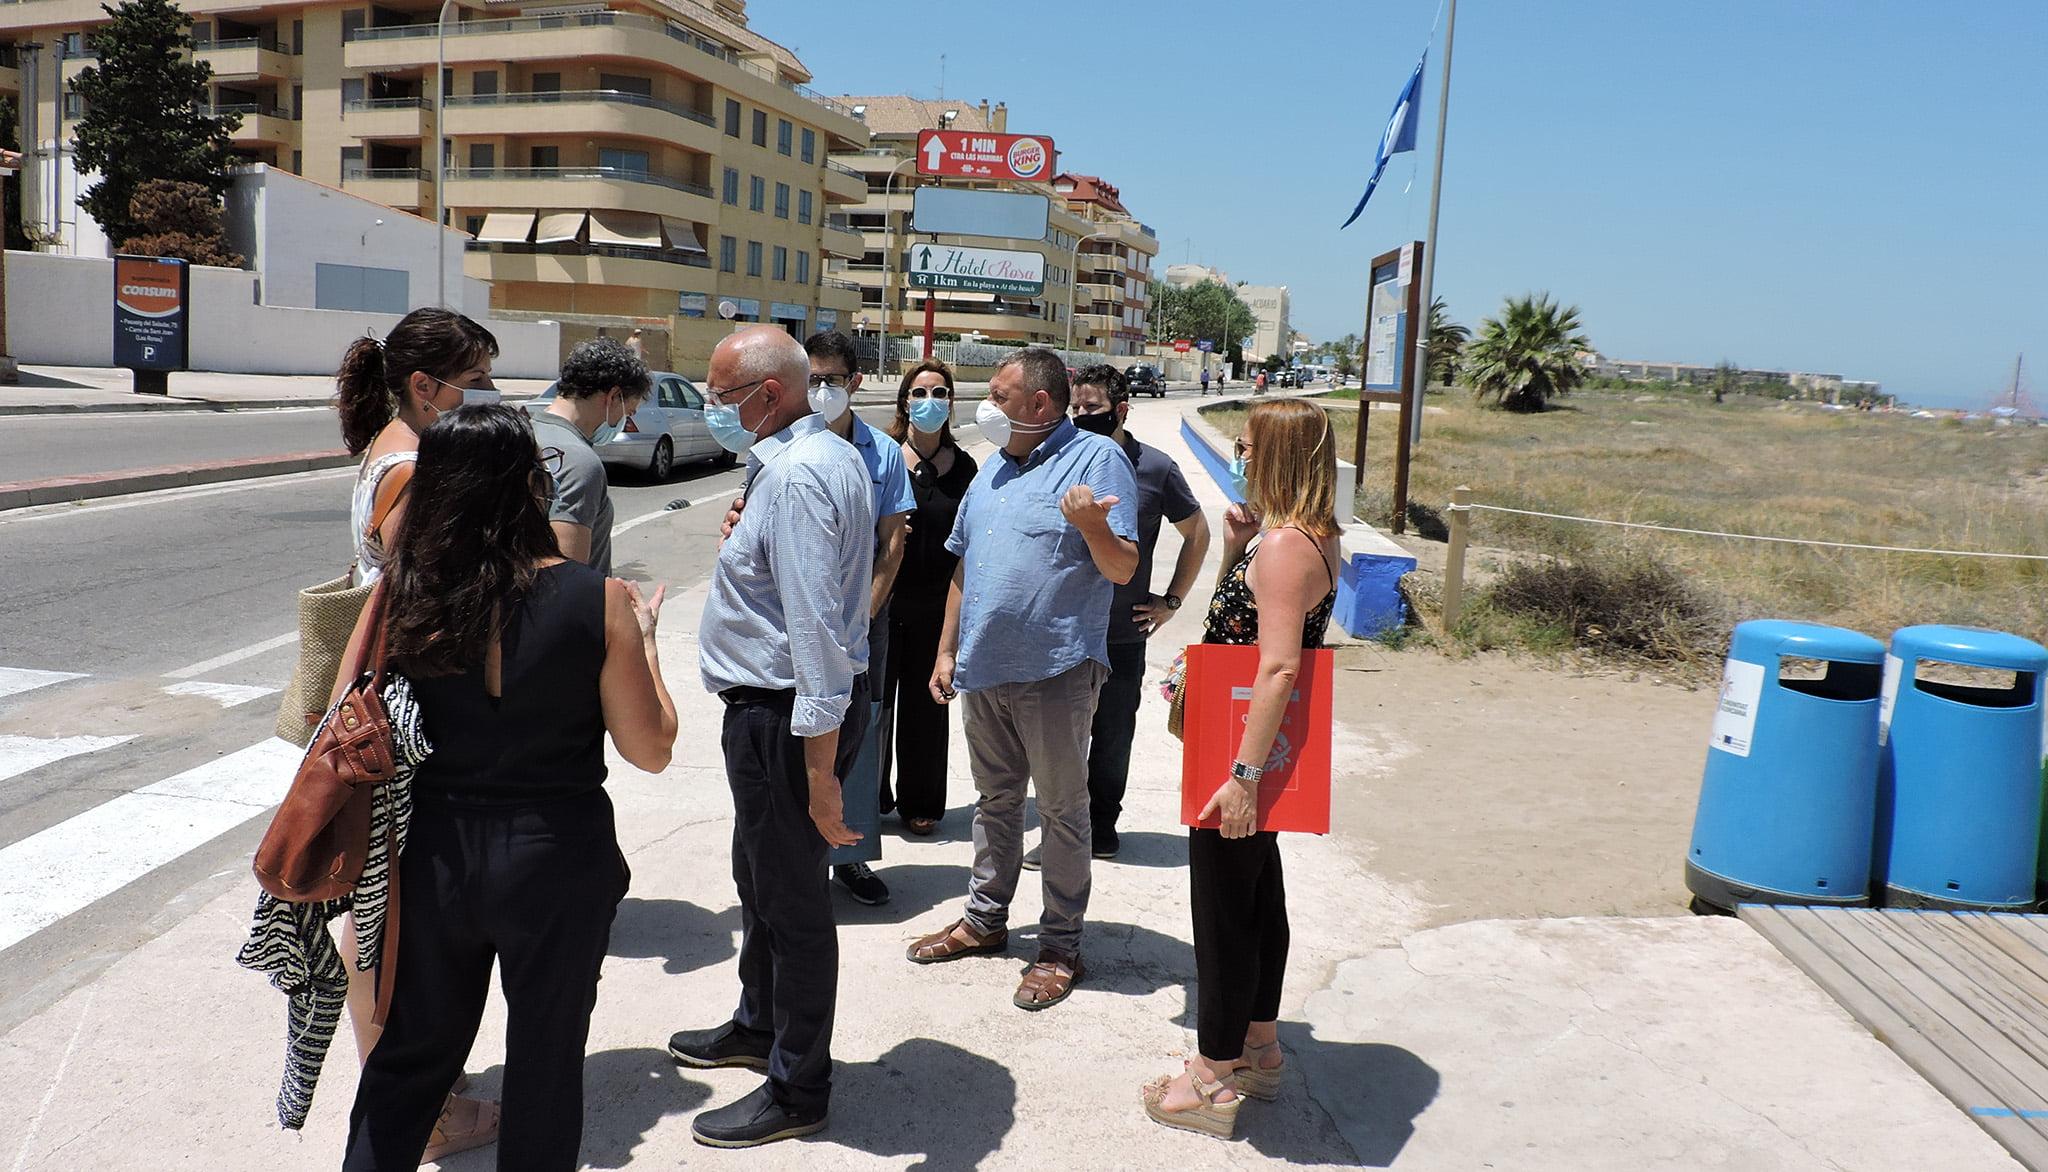 Visit of Francesc Colomer at Punta del Raset beach